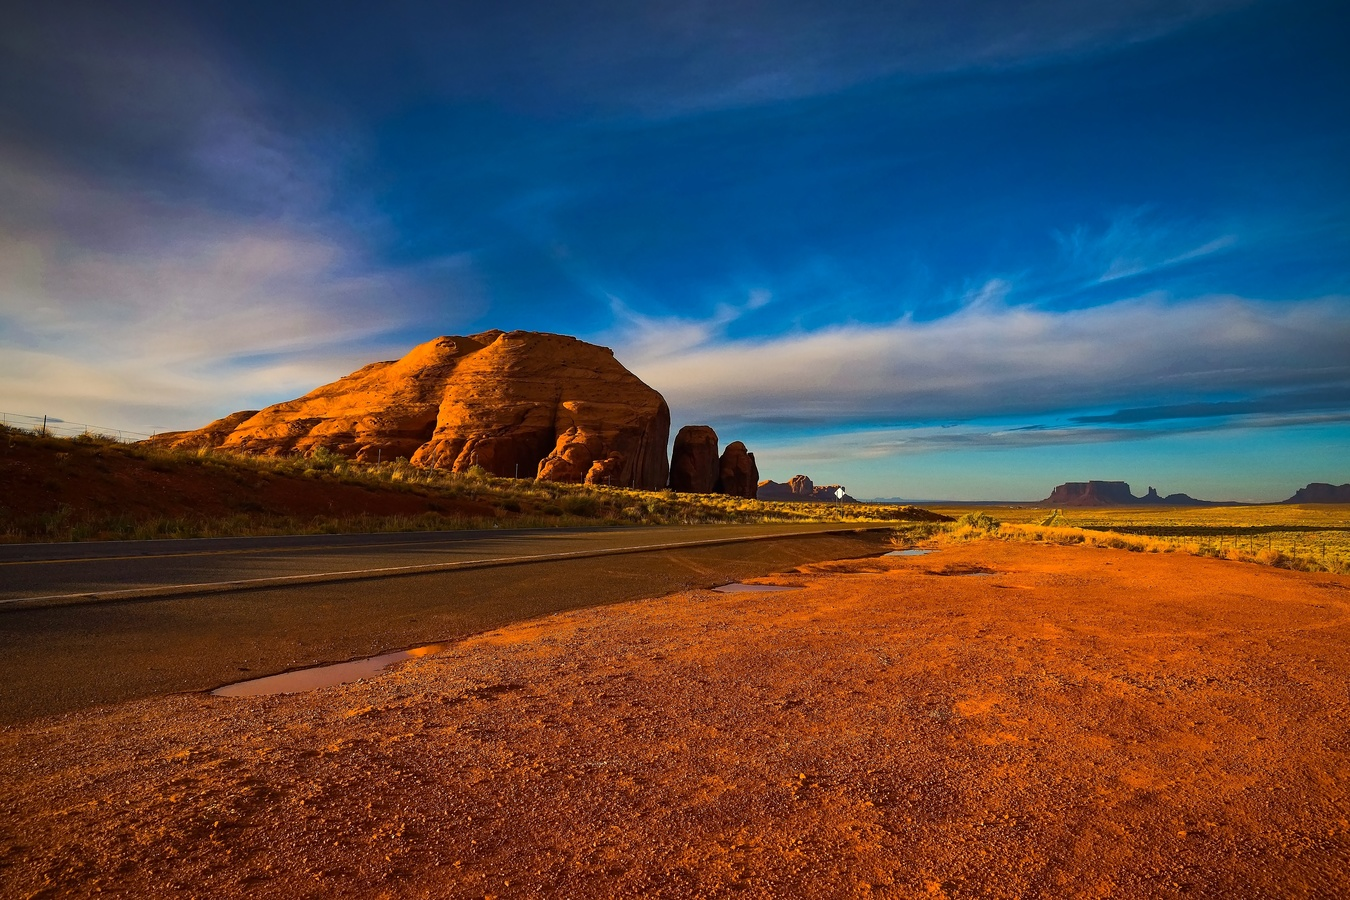 Západ slunce v Monument Valley